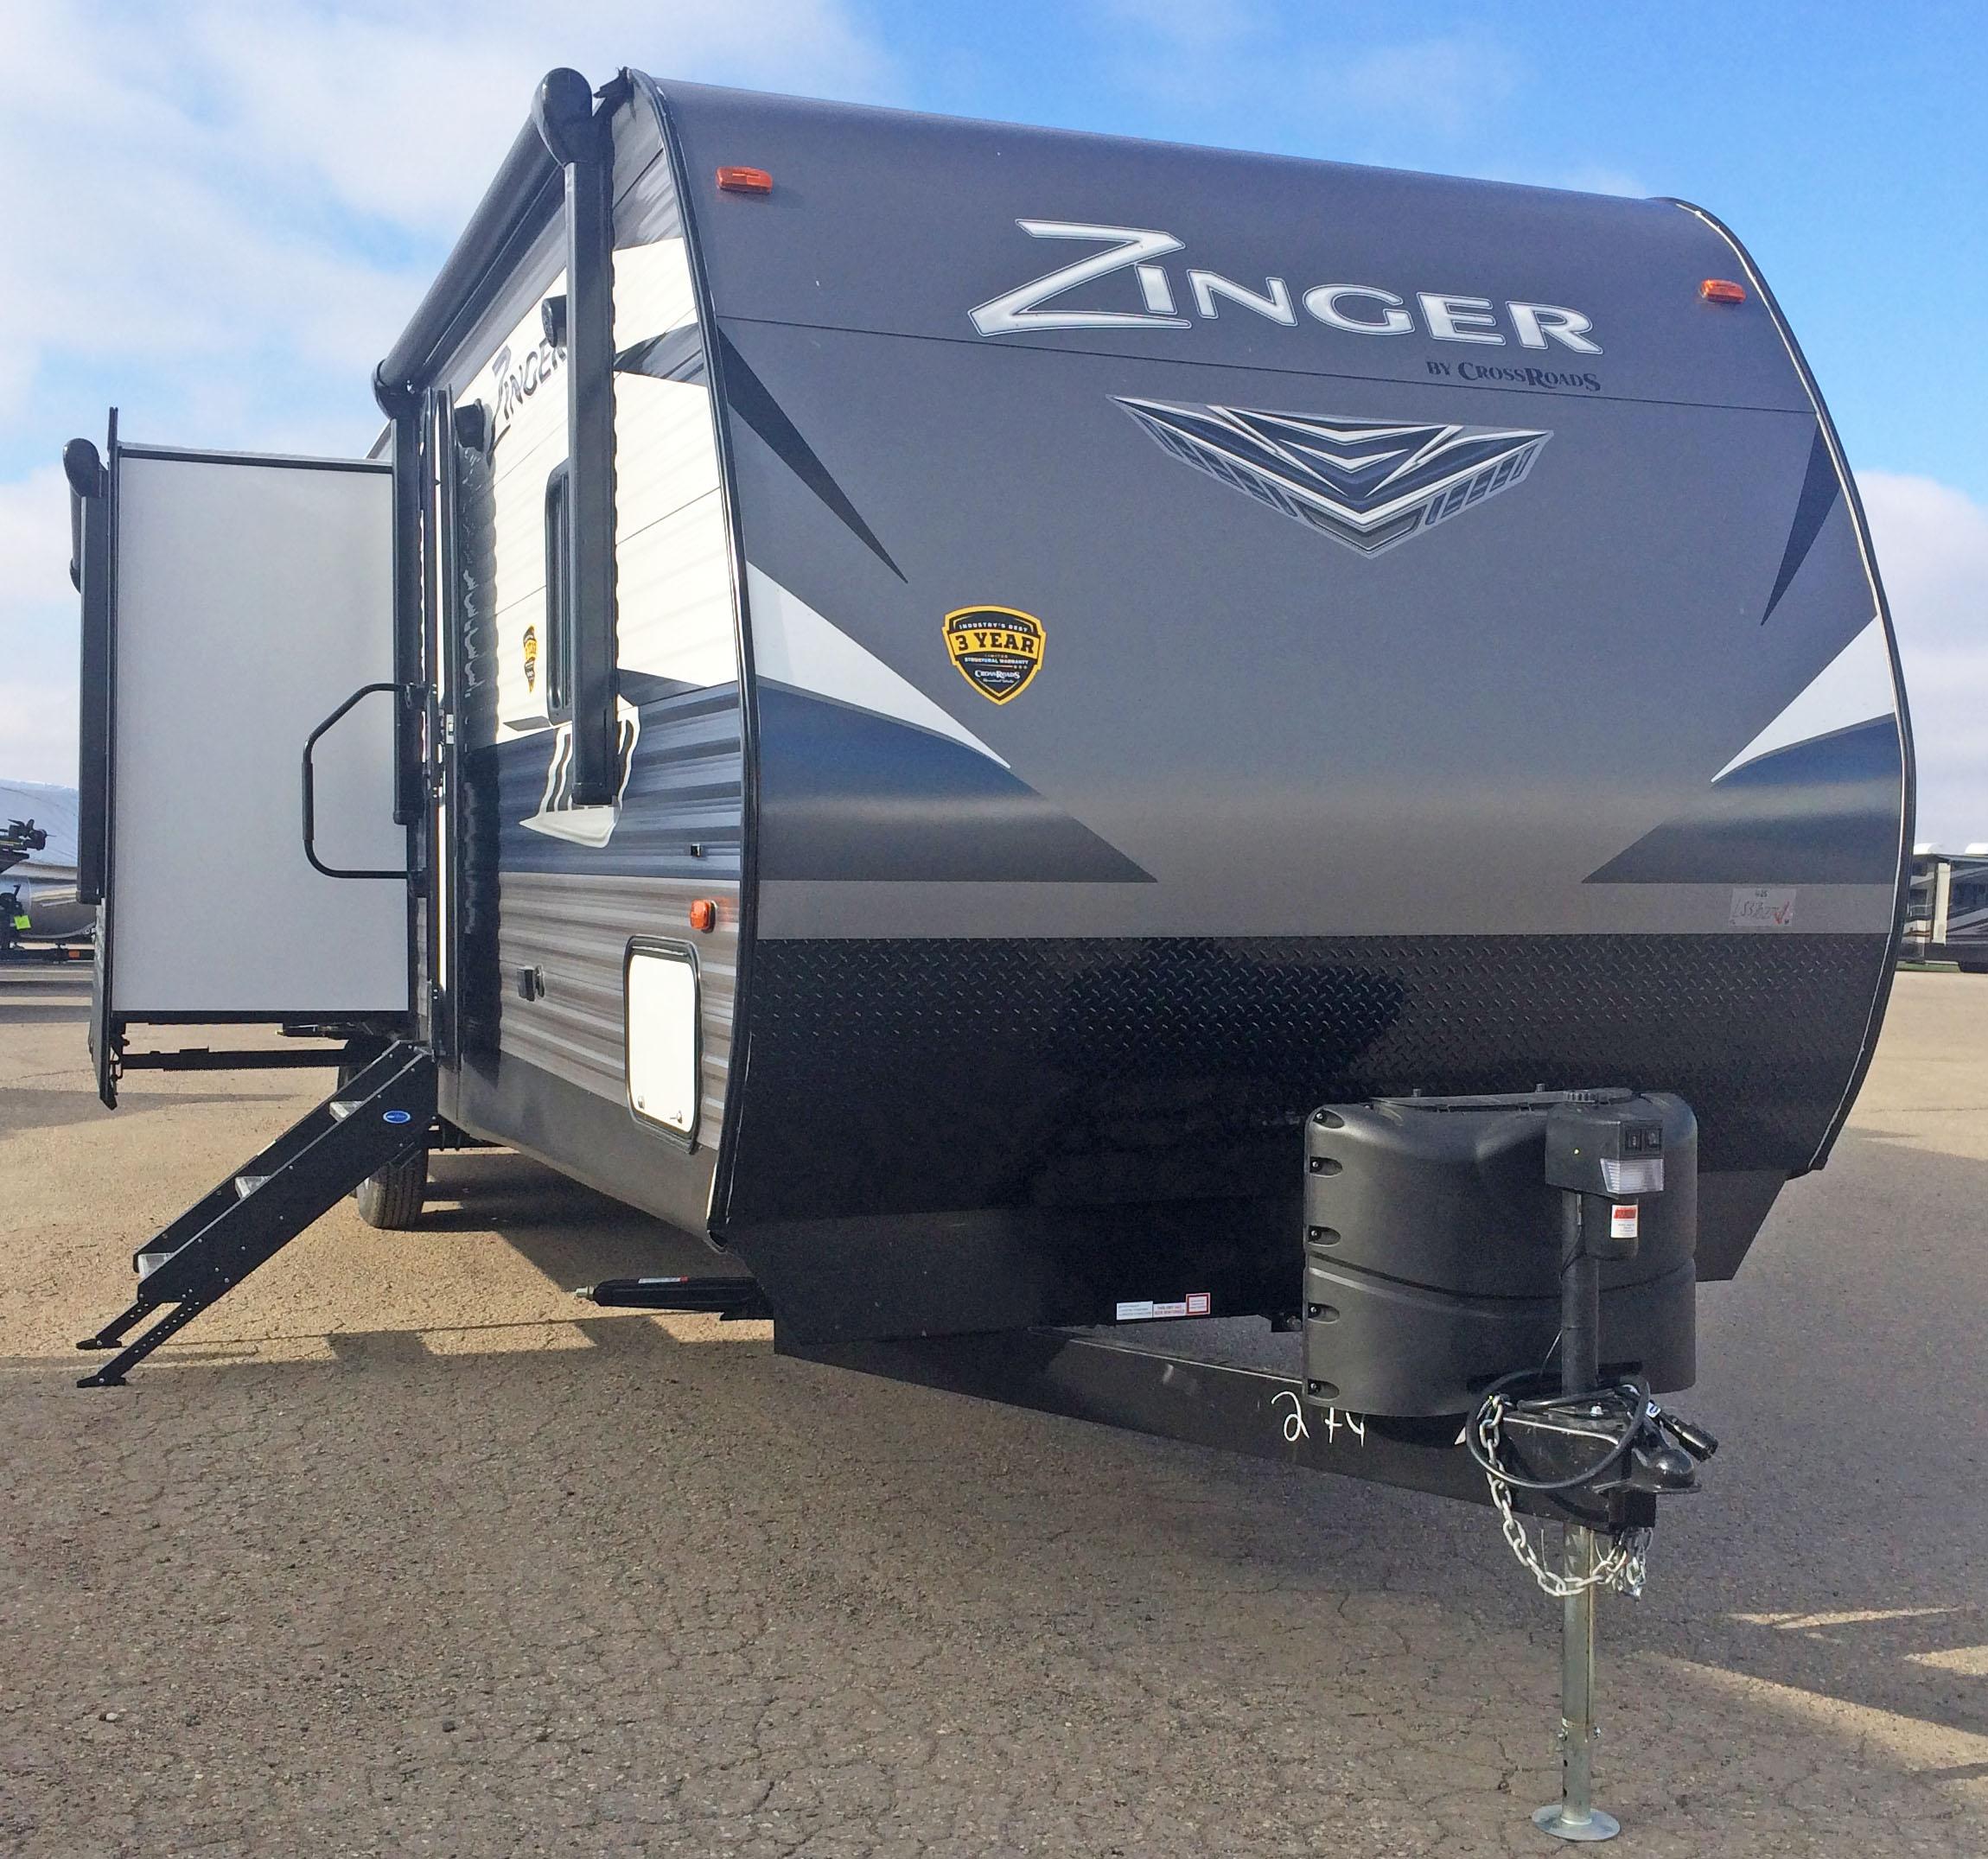 20TT3310 2020 Crossroads Zinger 333DB Price: $36.426 Minot ND - Swenson Marine & RV